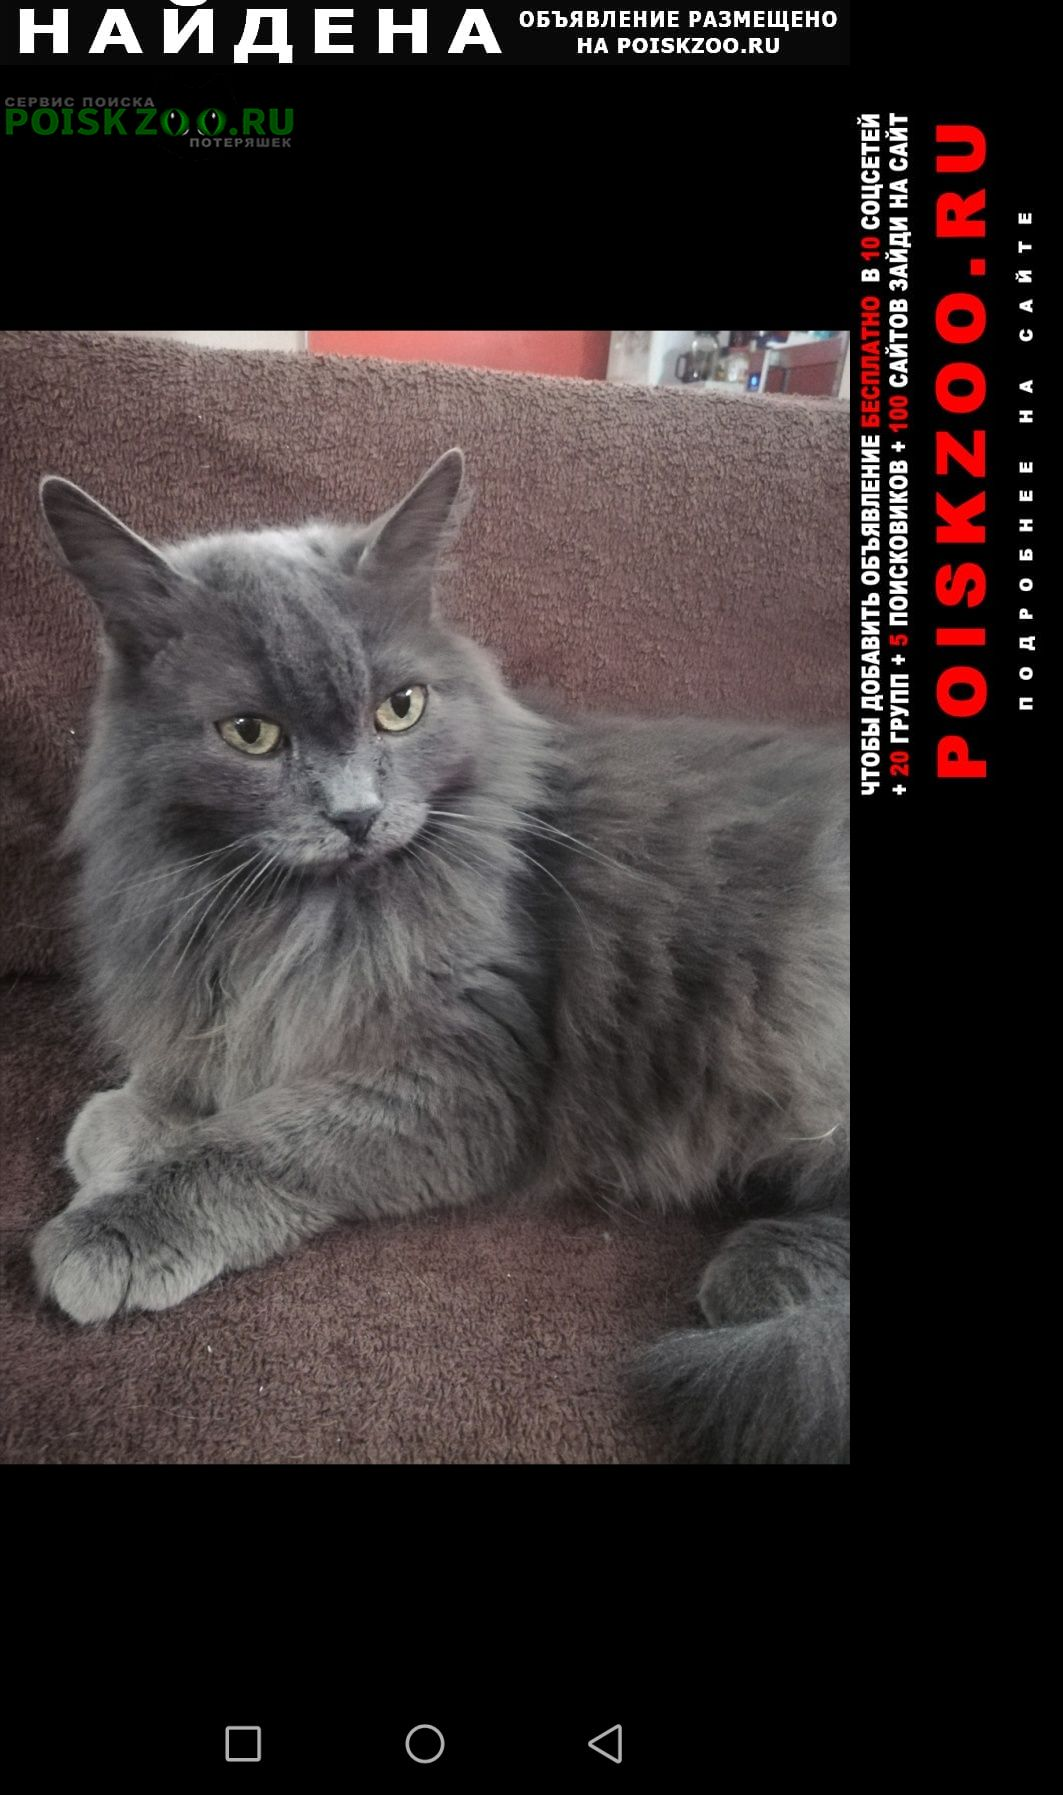 Найдена кошка потеряшка Таганрог